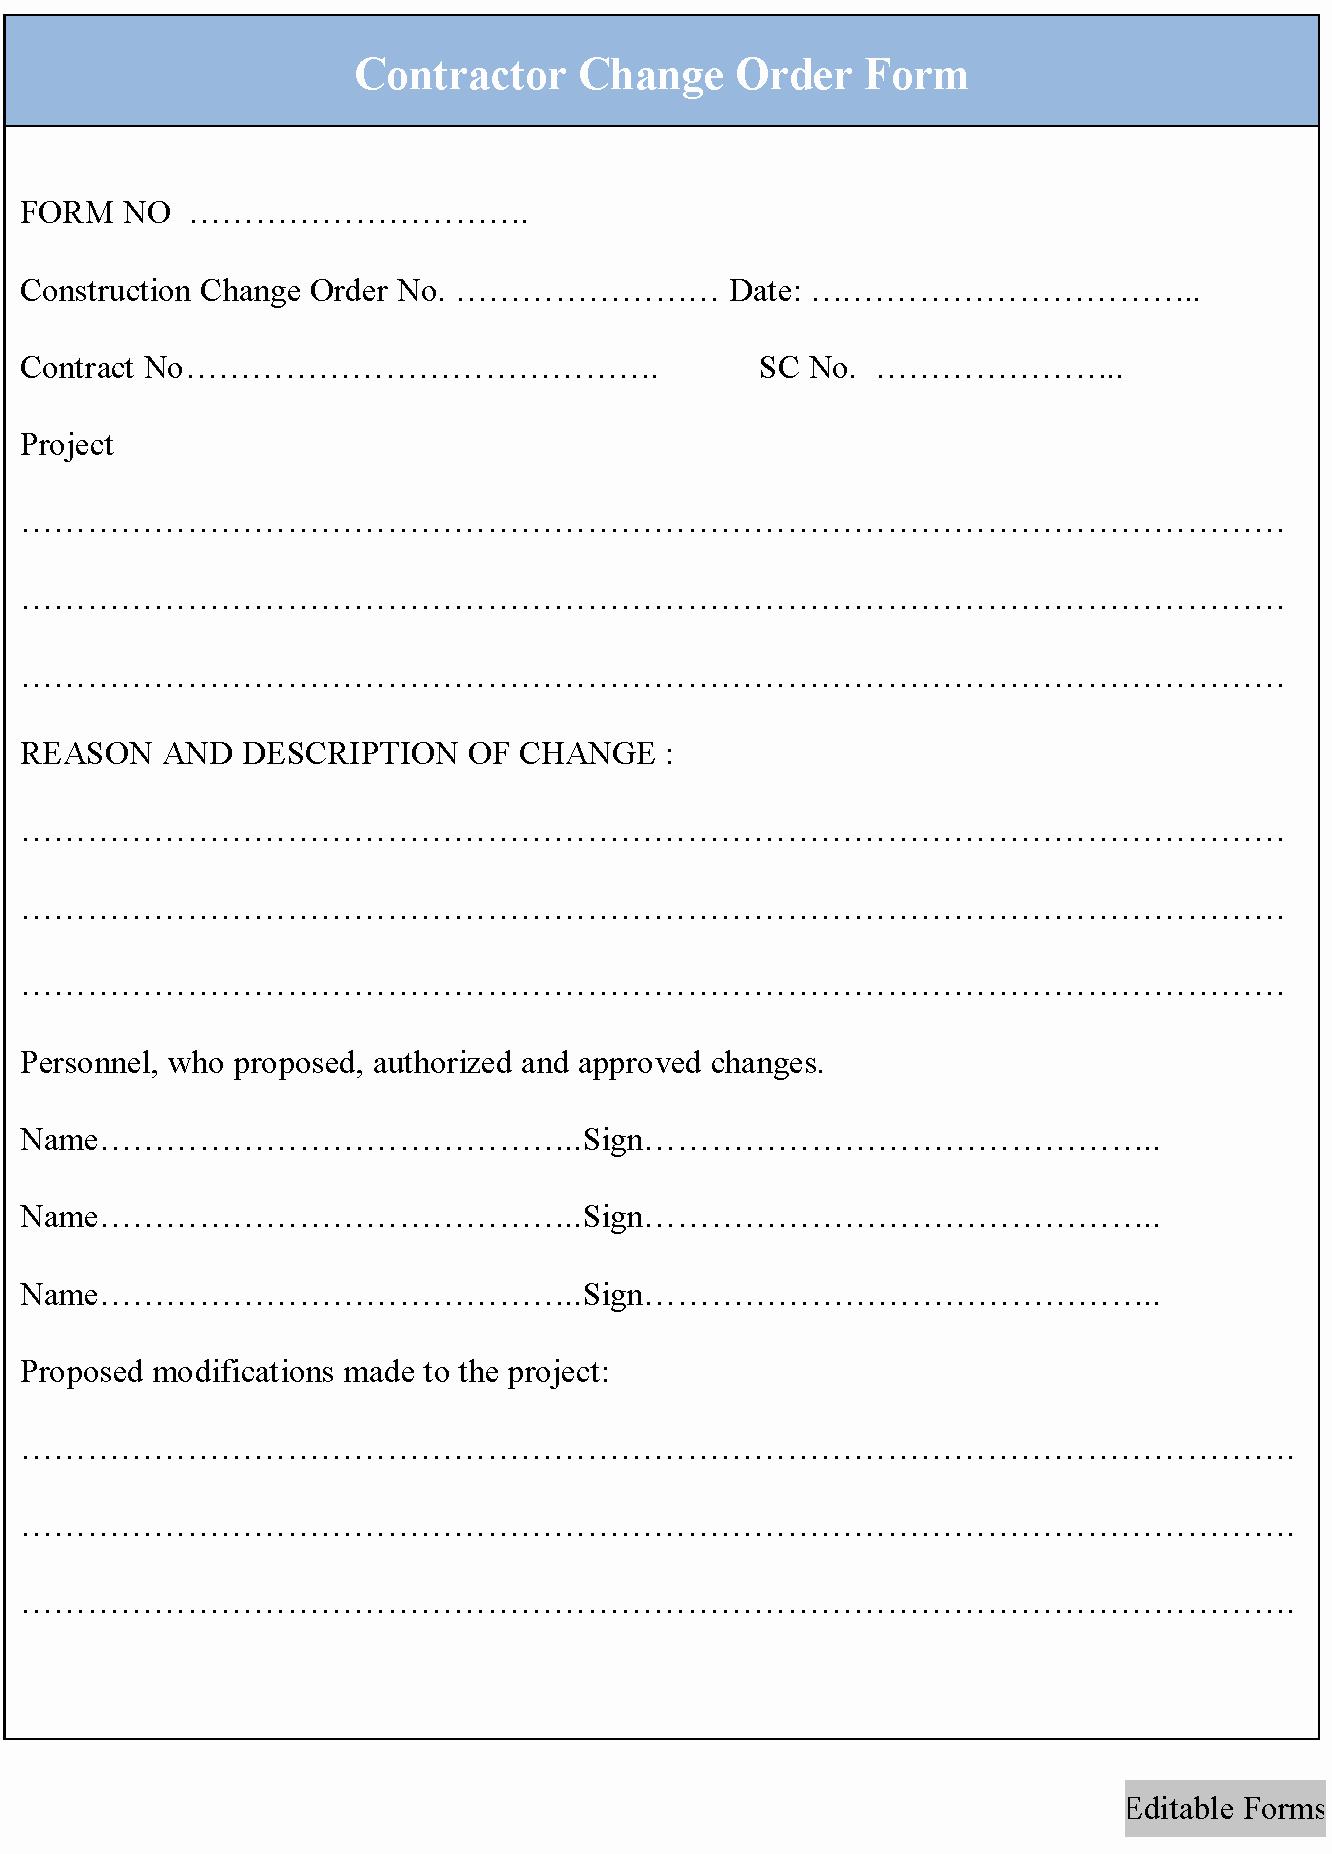 Change order form Unique Contractor Change order form